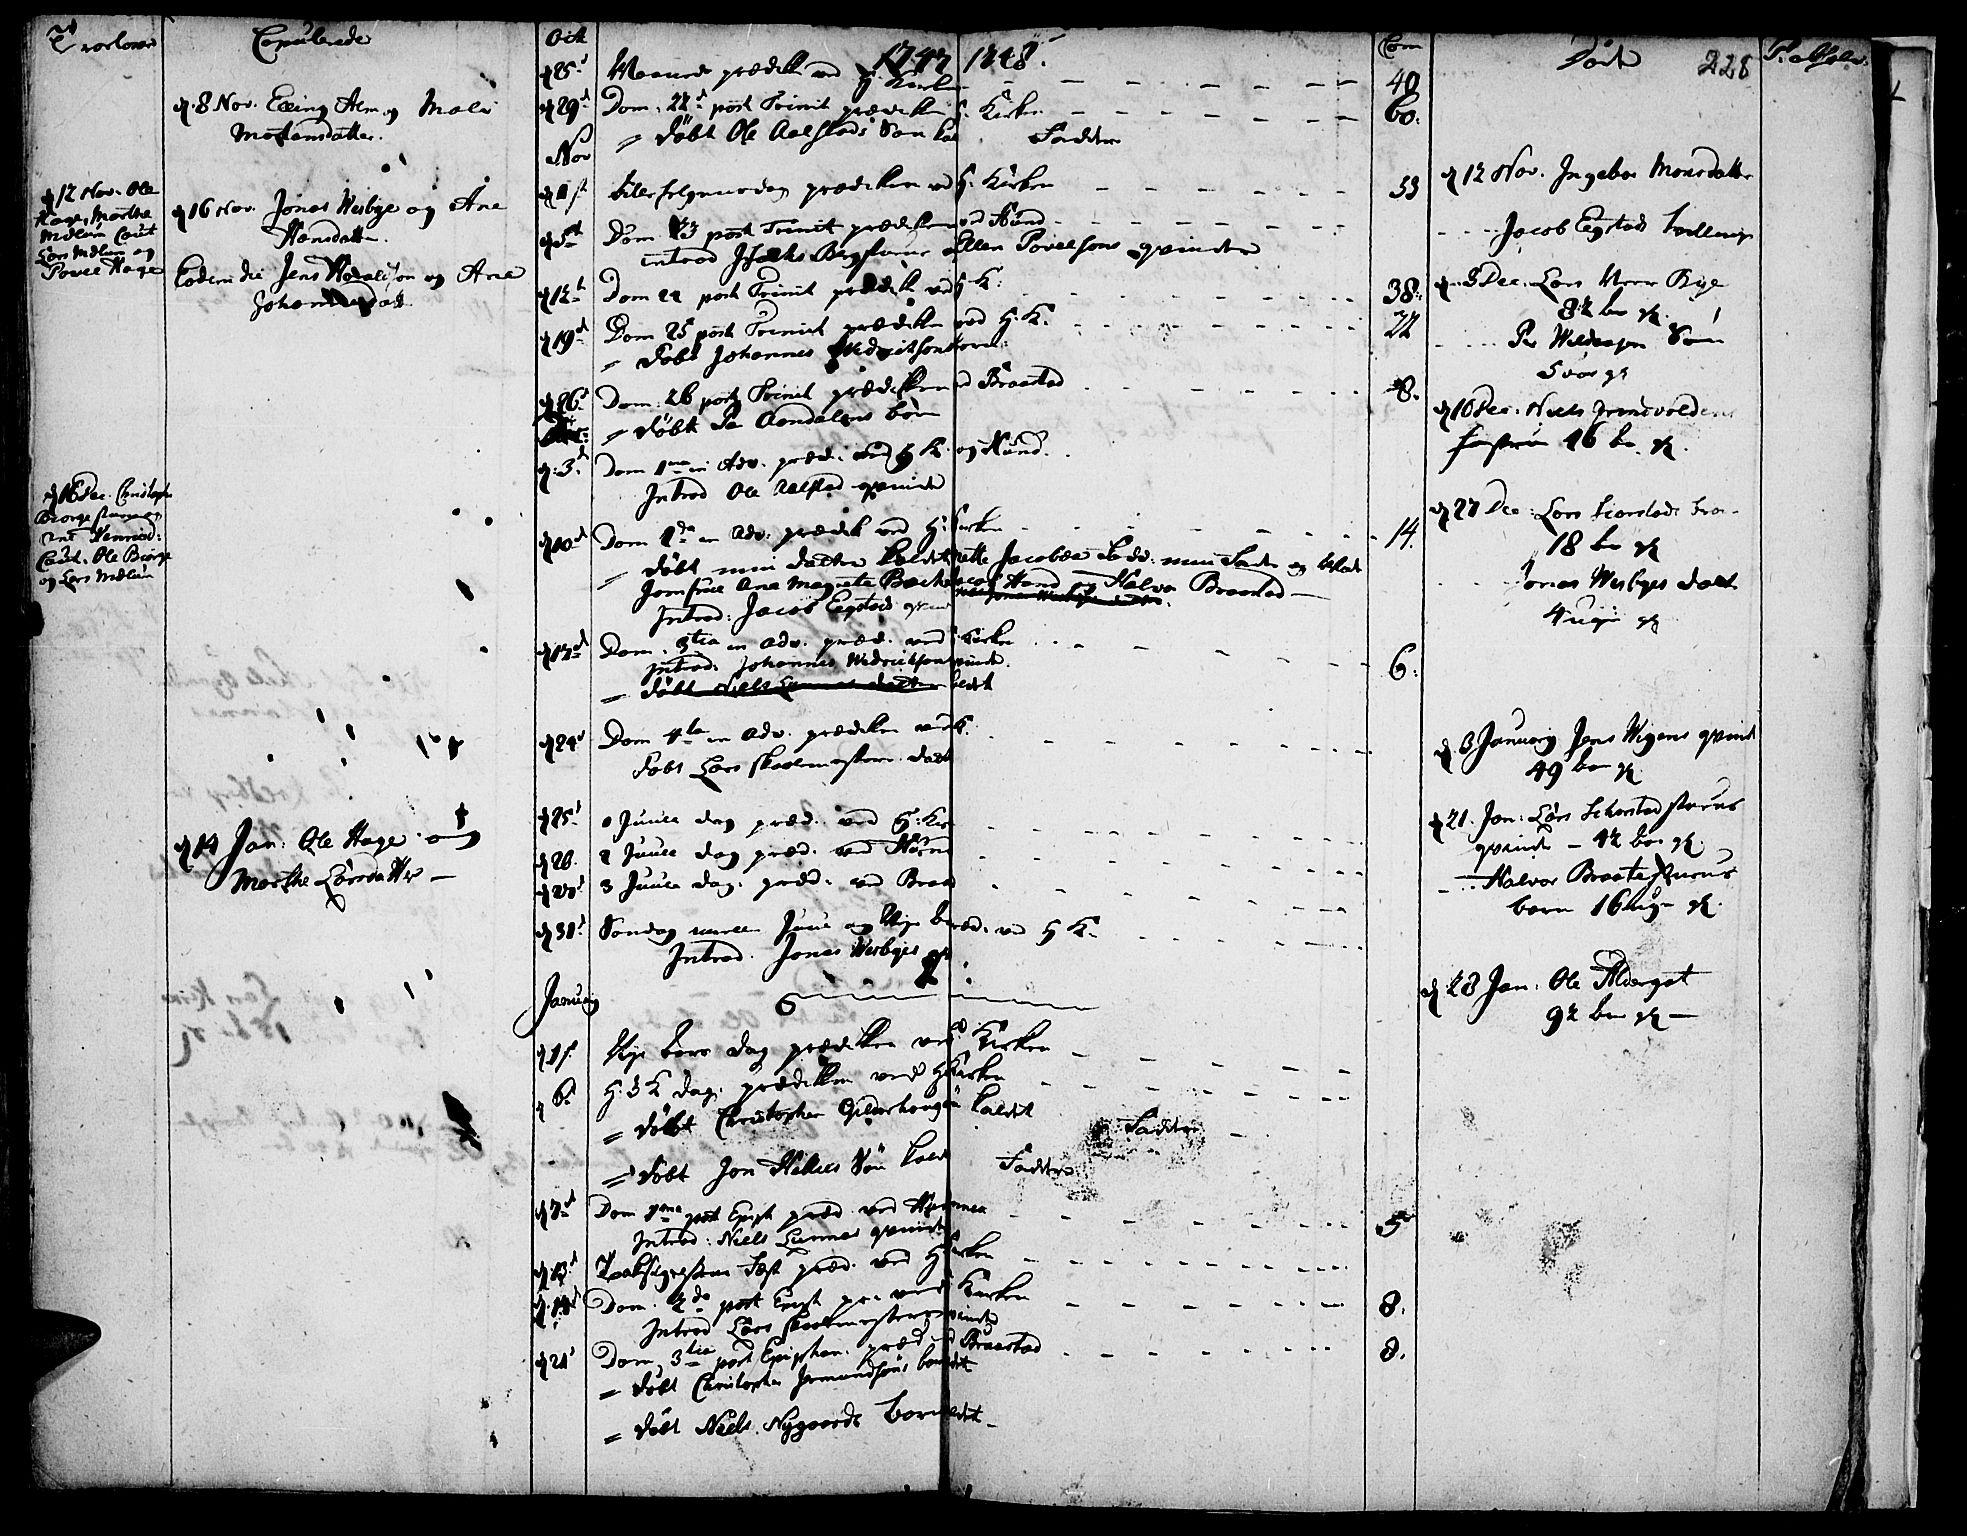 SAH, Vardal prestekontor, H/Ha/Haa/L0001: Ministerialbok nr. 1, 1706-1748, s. 228